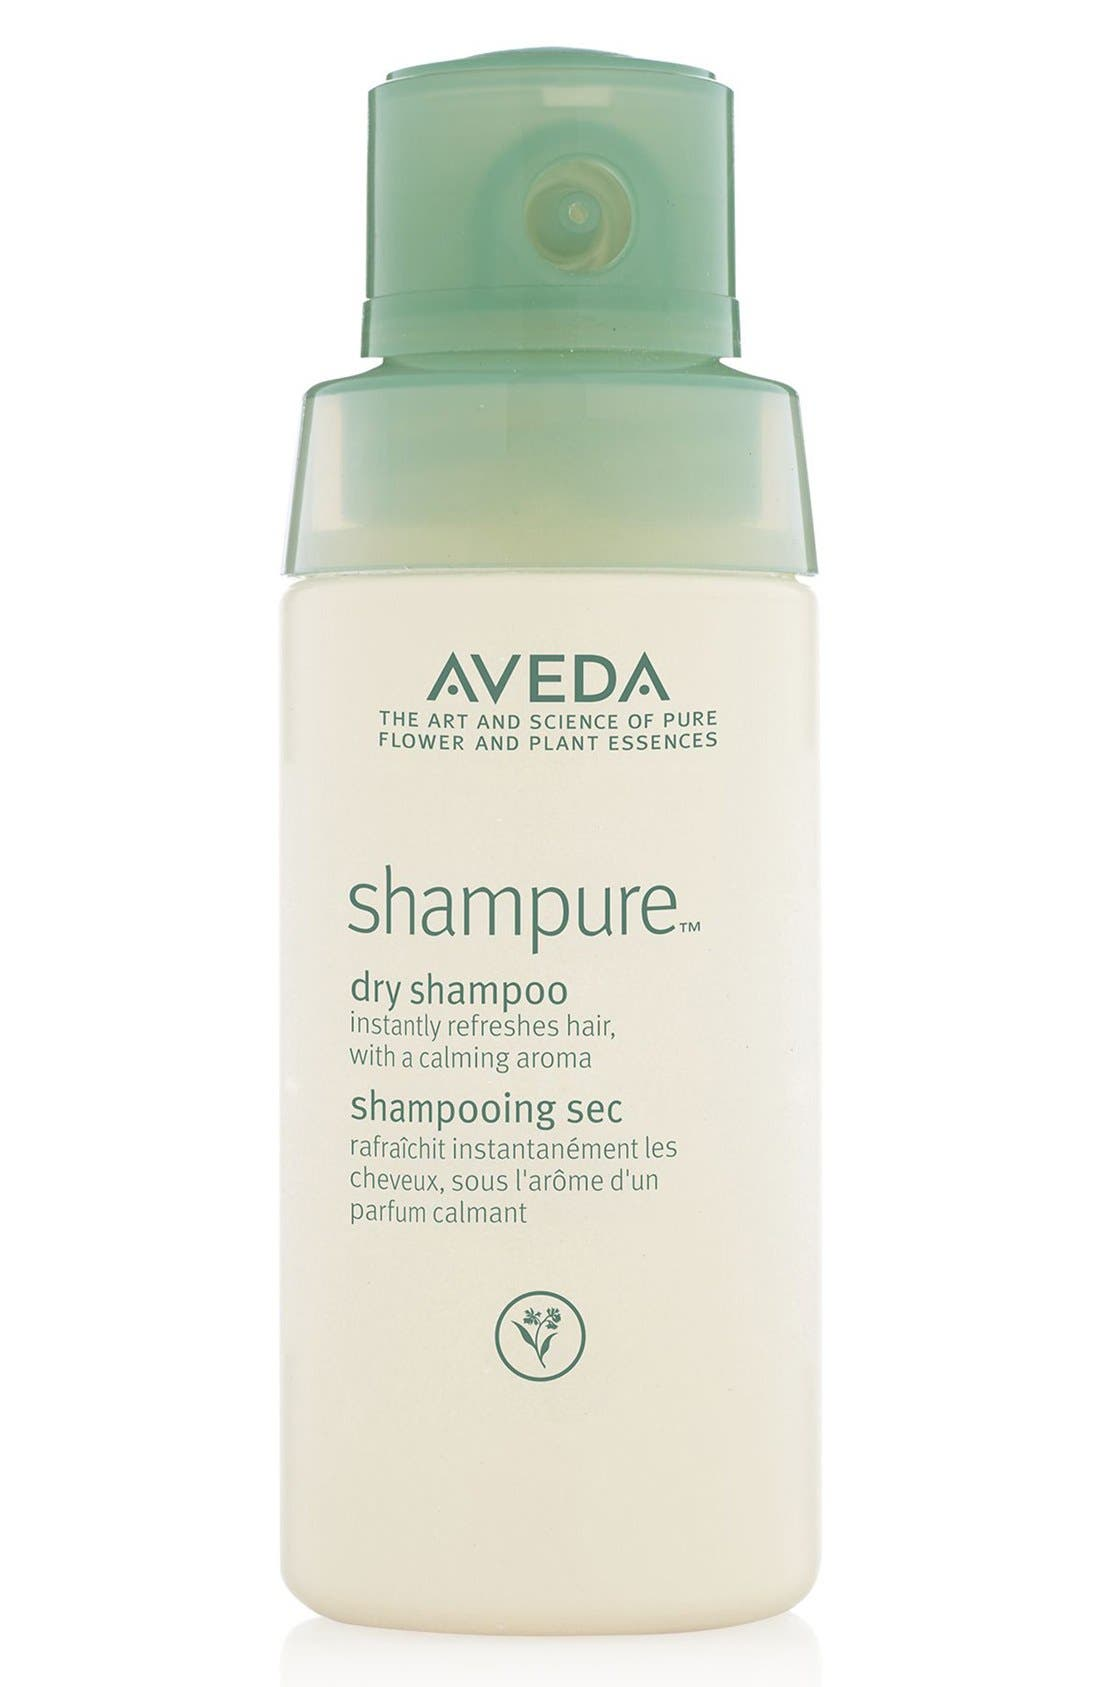 Aveda shampure™ Dry Shampoo